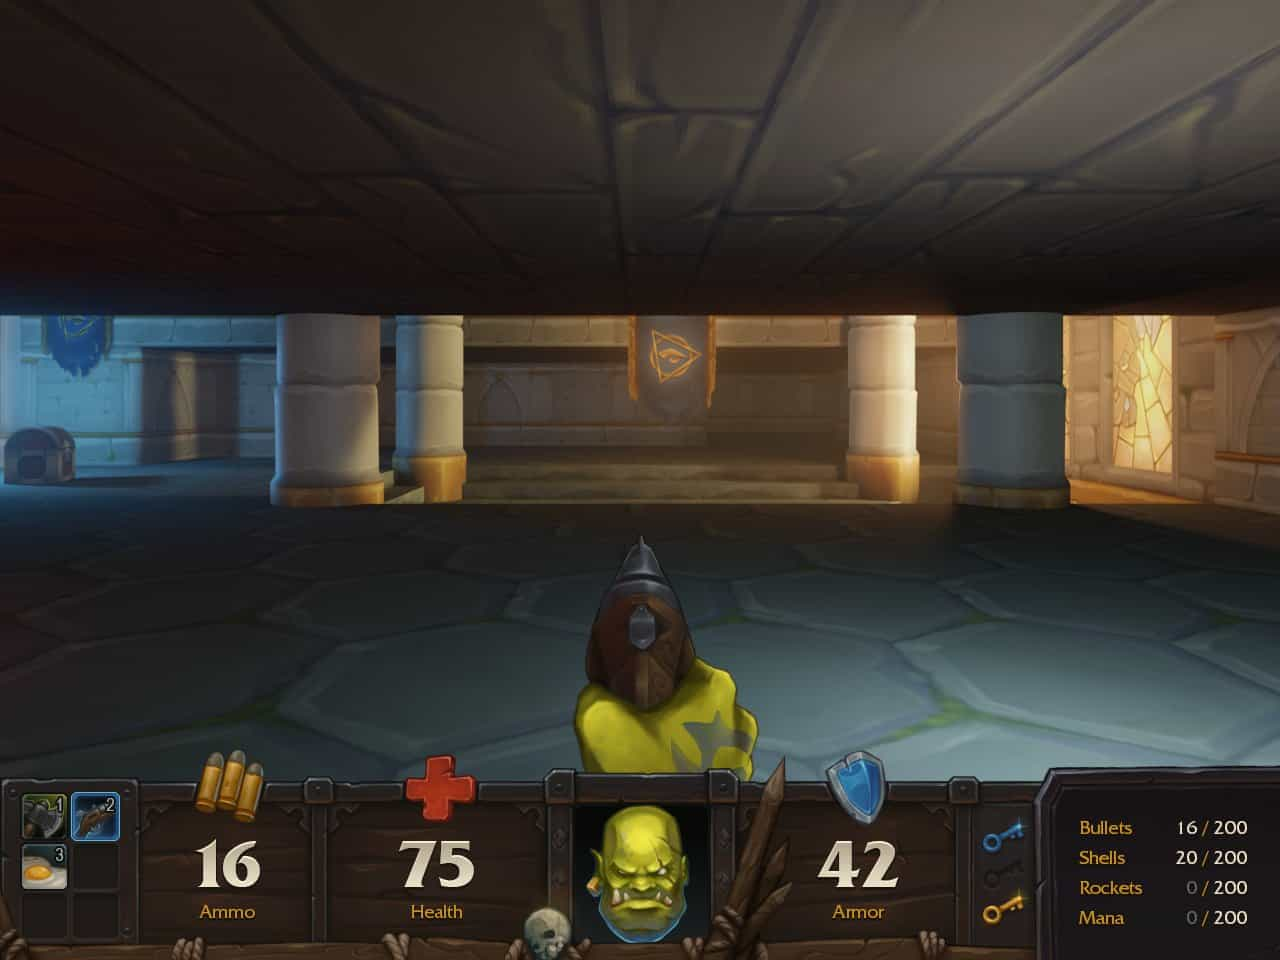 Warcraft Gets The Doom Treatment In DoomCraft: A Design Mashup 3